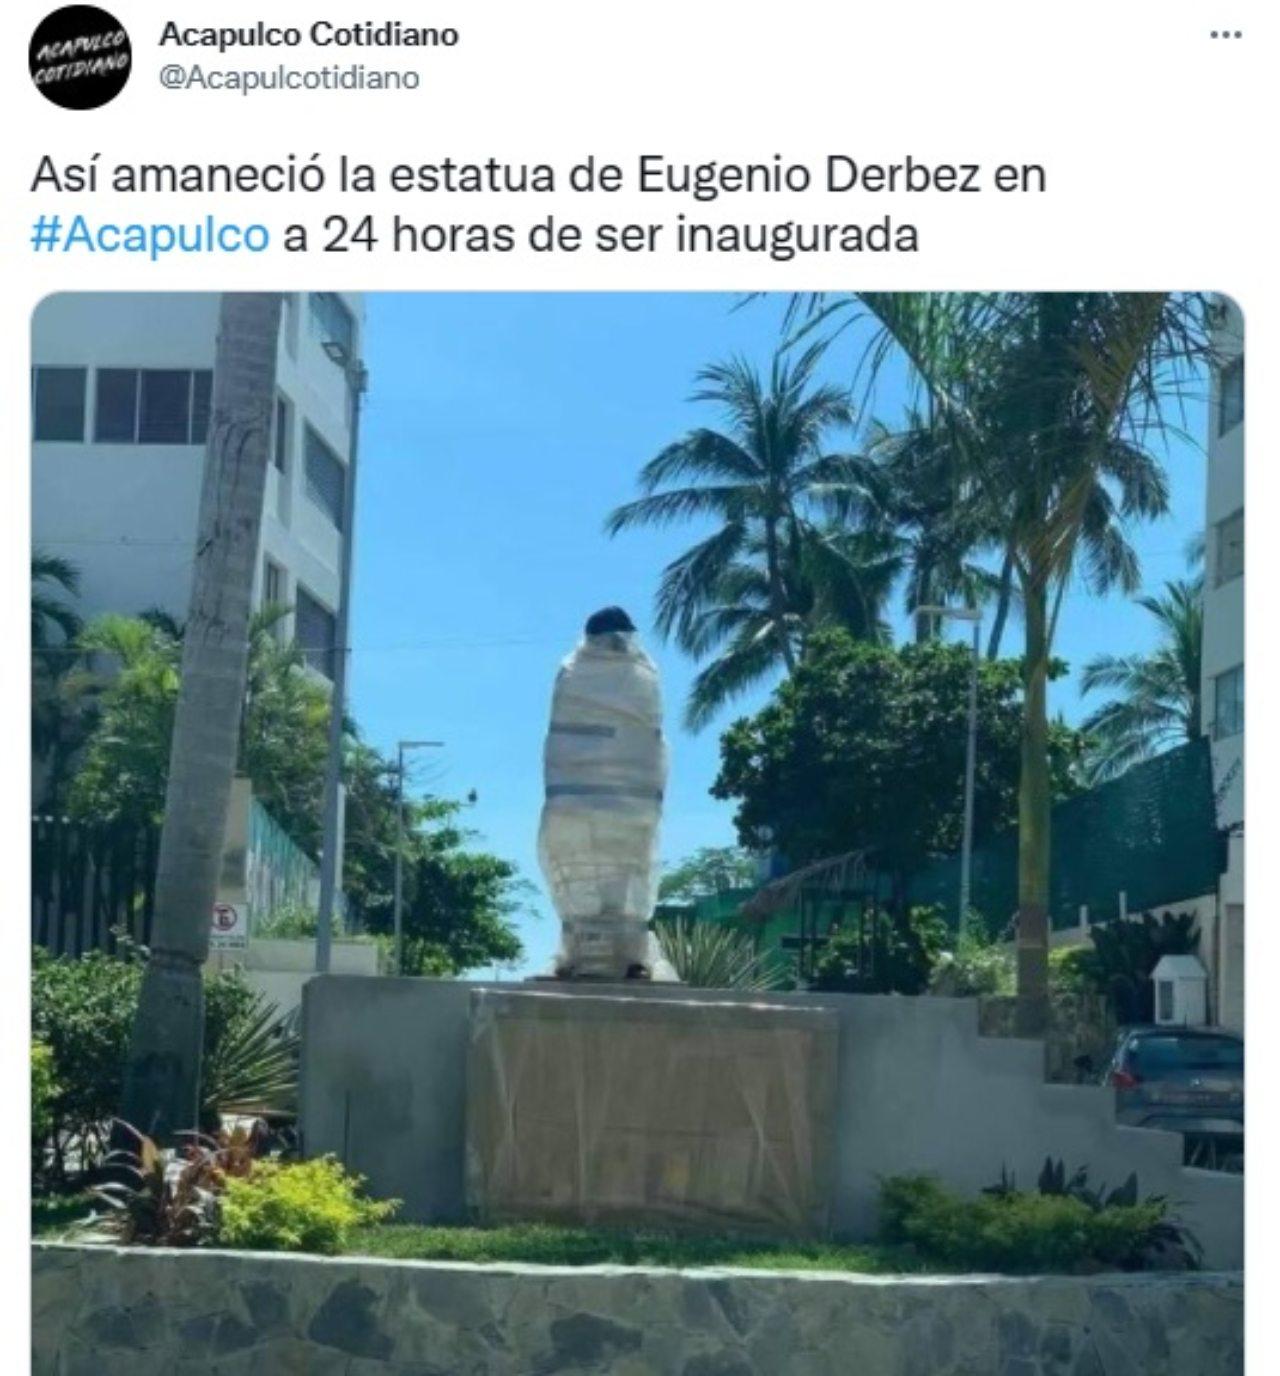 Tapan estatua de Eugenio Derbez Acapulco